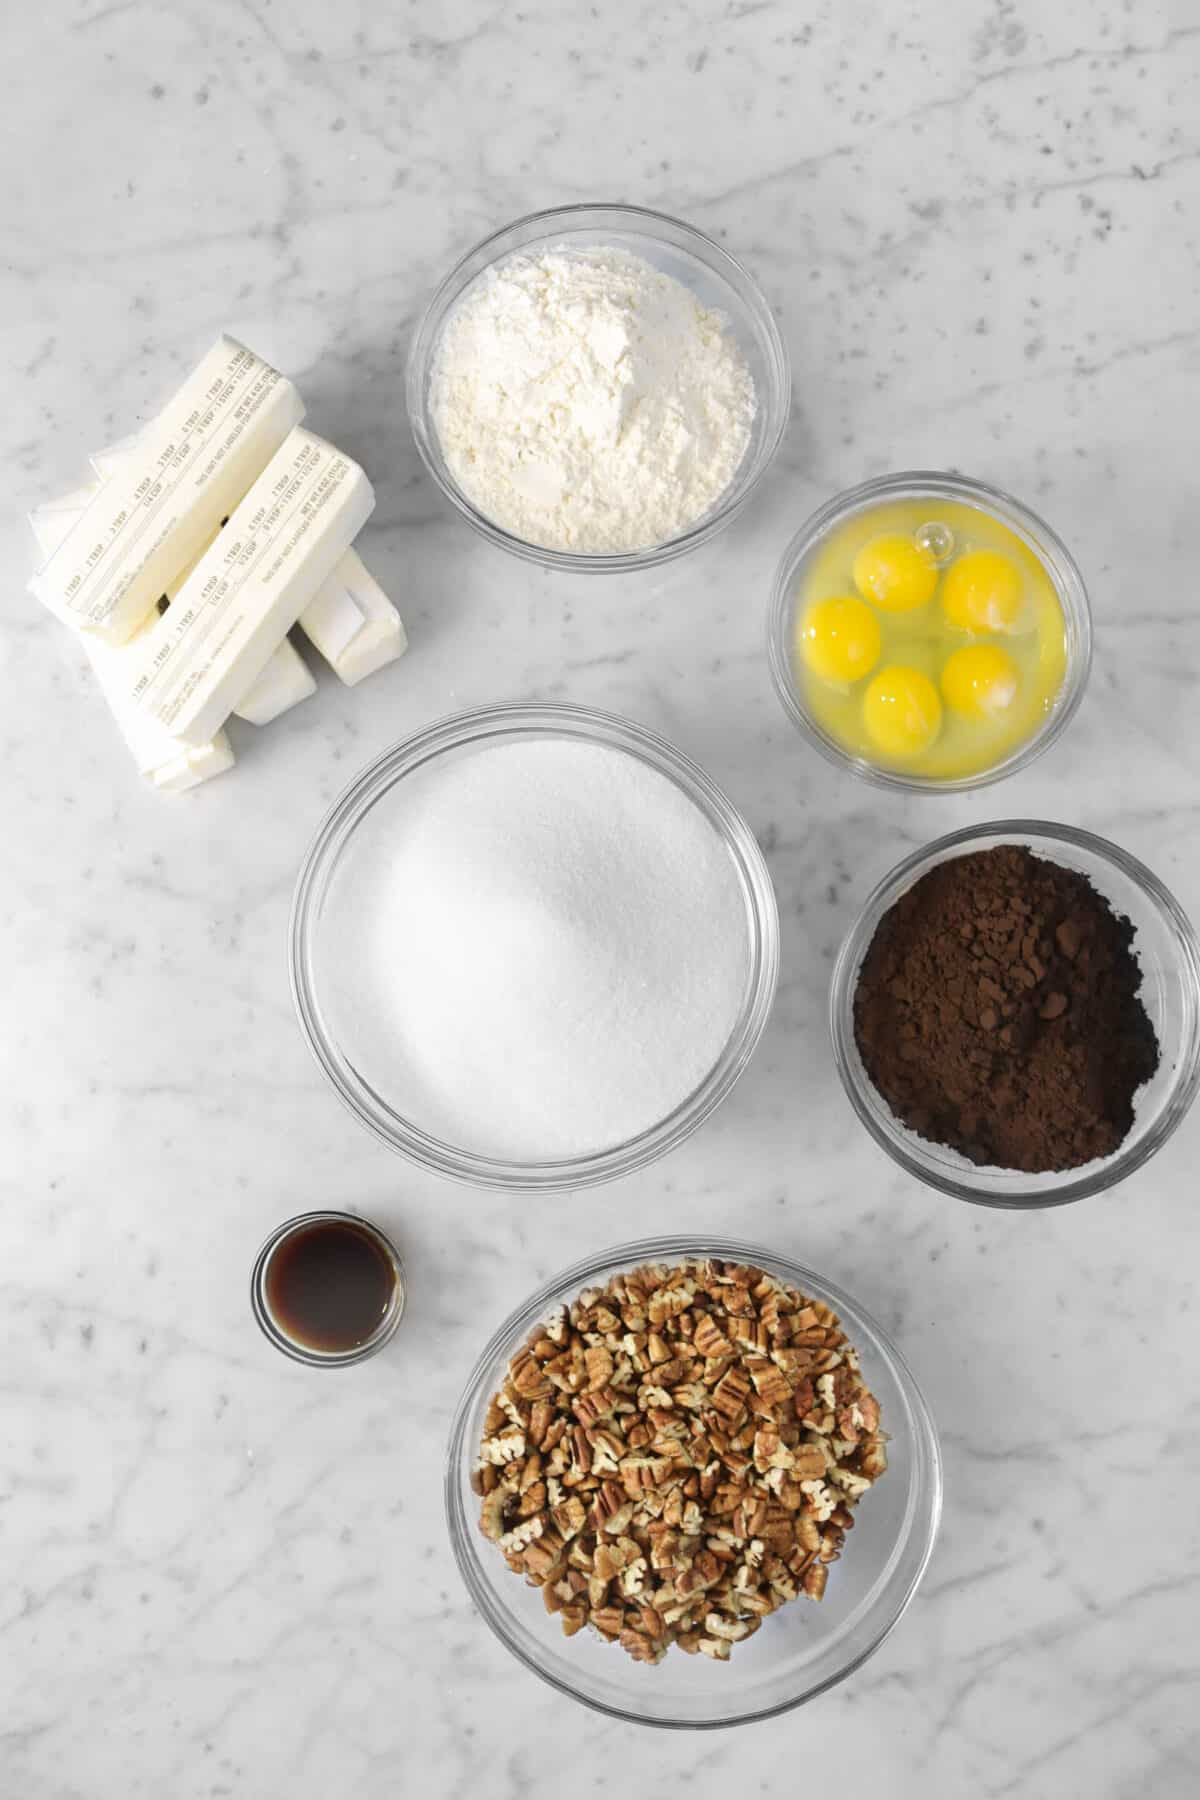 butter, flour, eggs, cocoa powder, pecans, vanilla, and sugar in bowls